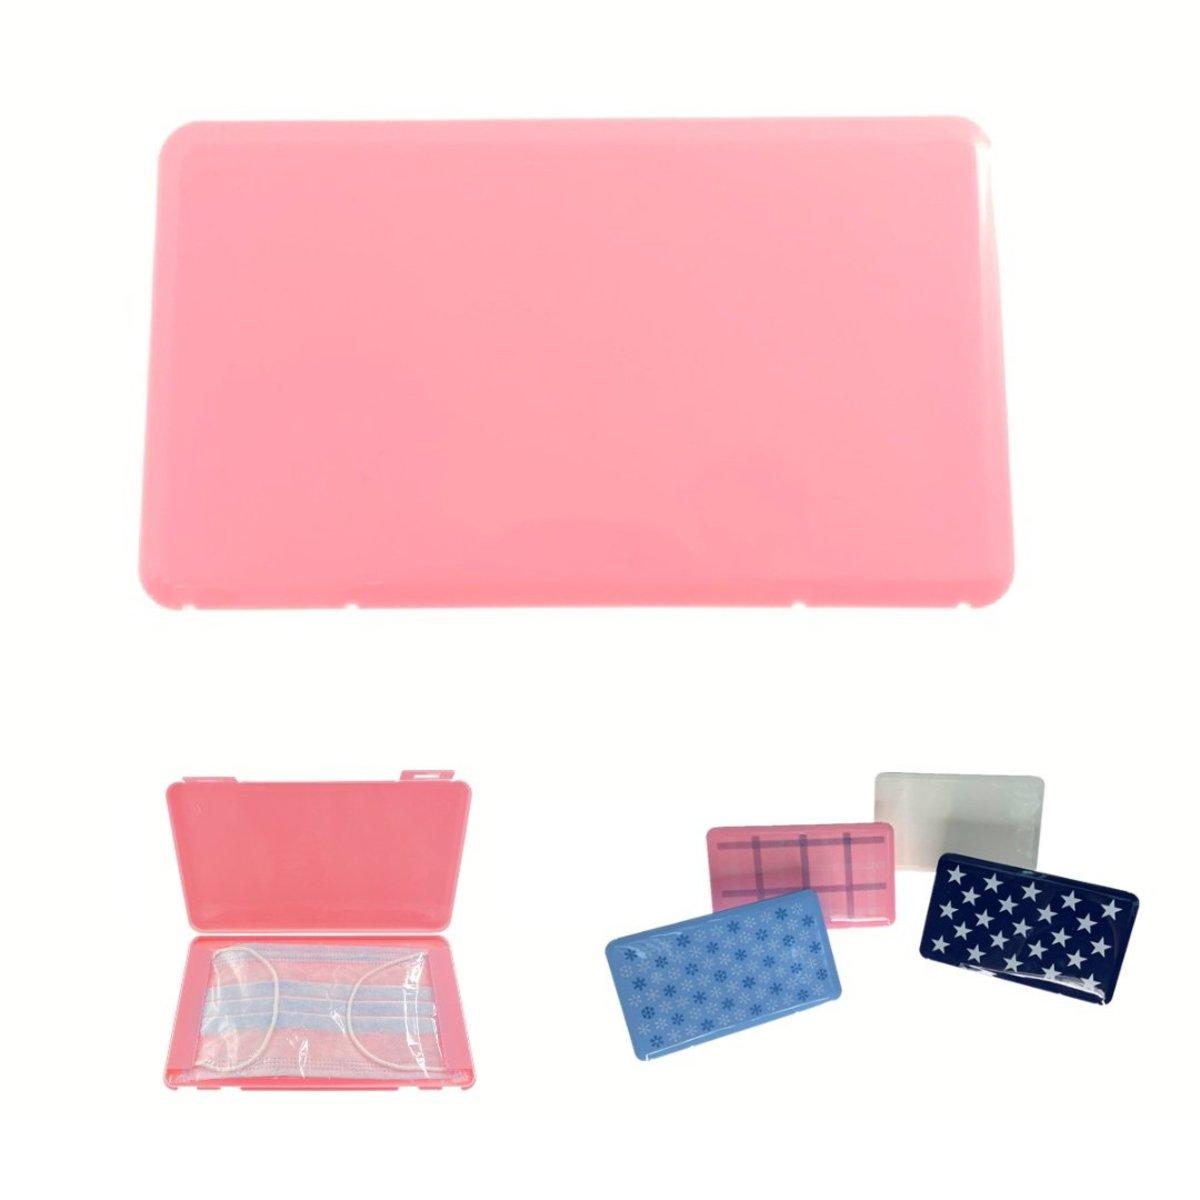 Anti-Dirt Storage Mask boxe-Pink (19*11*1cm)